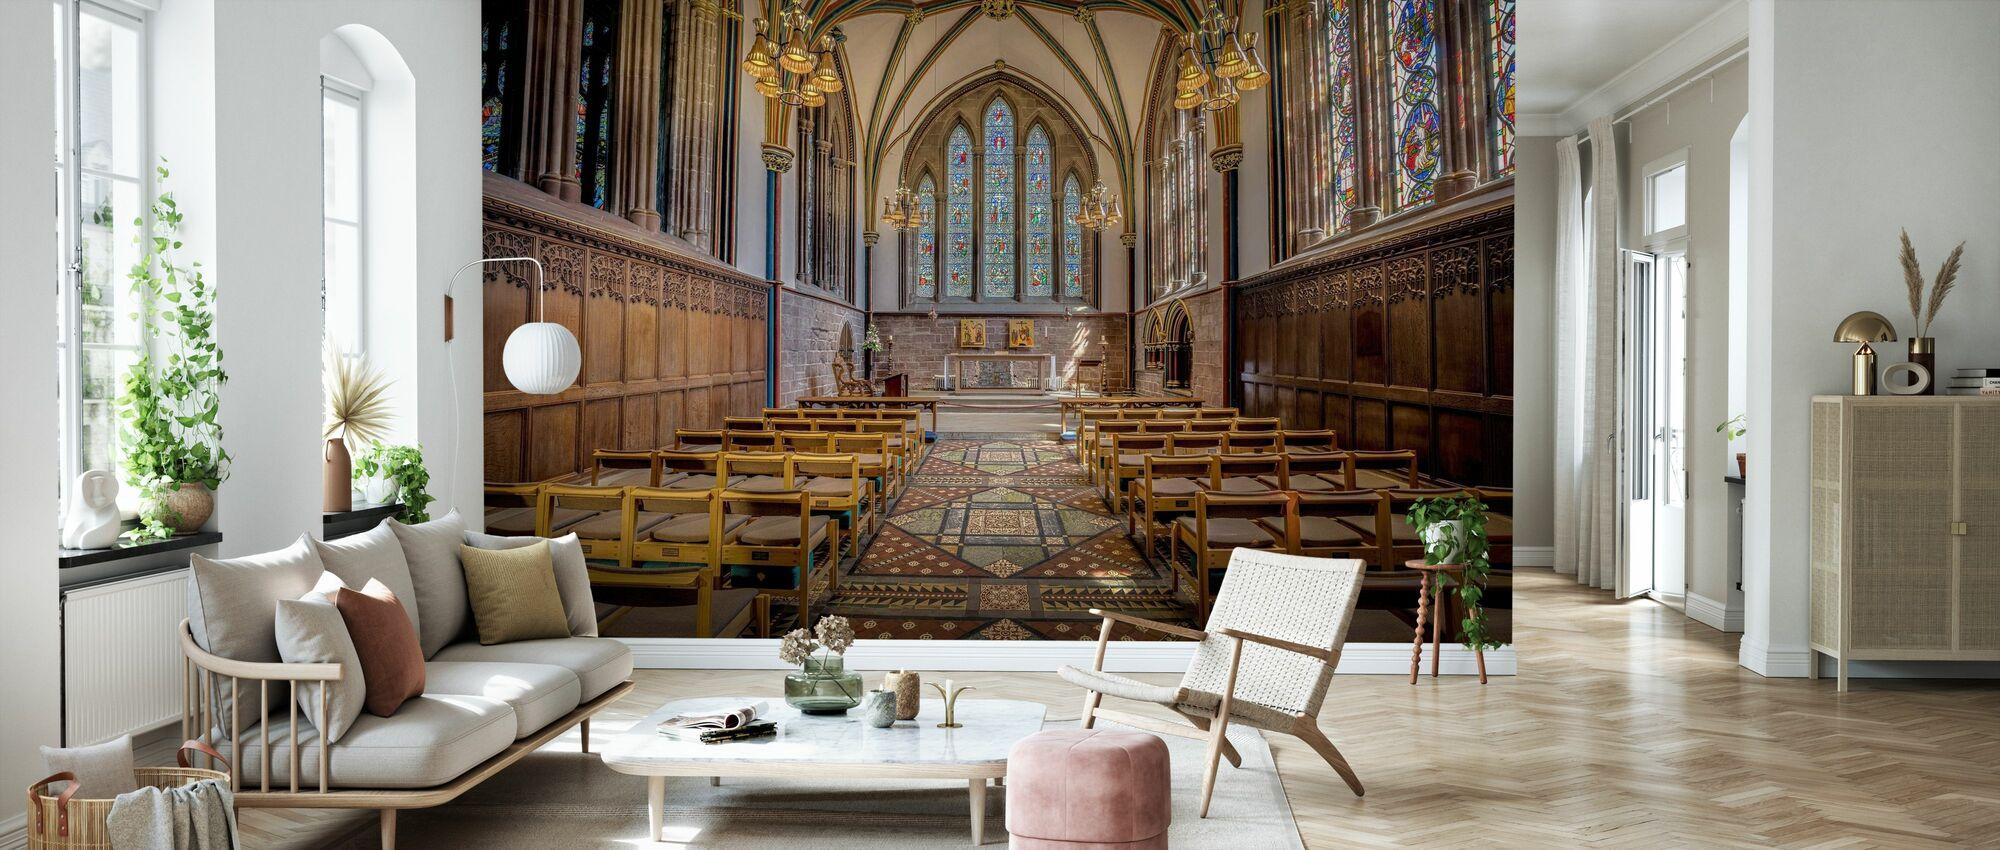 Lady Chapel - Wallpaper - Living Room